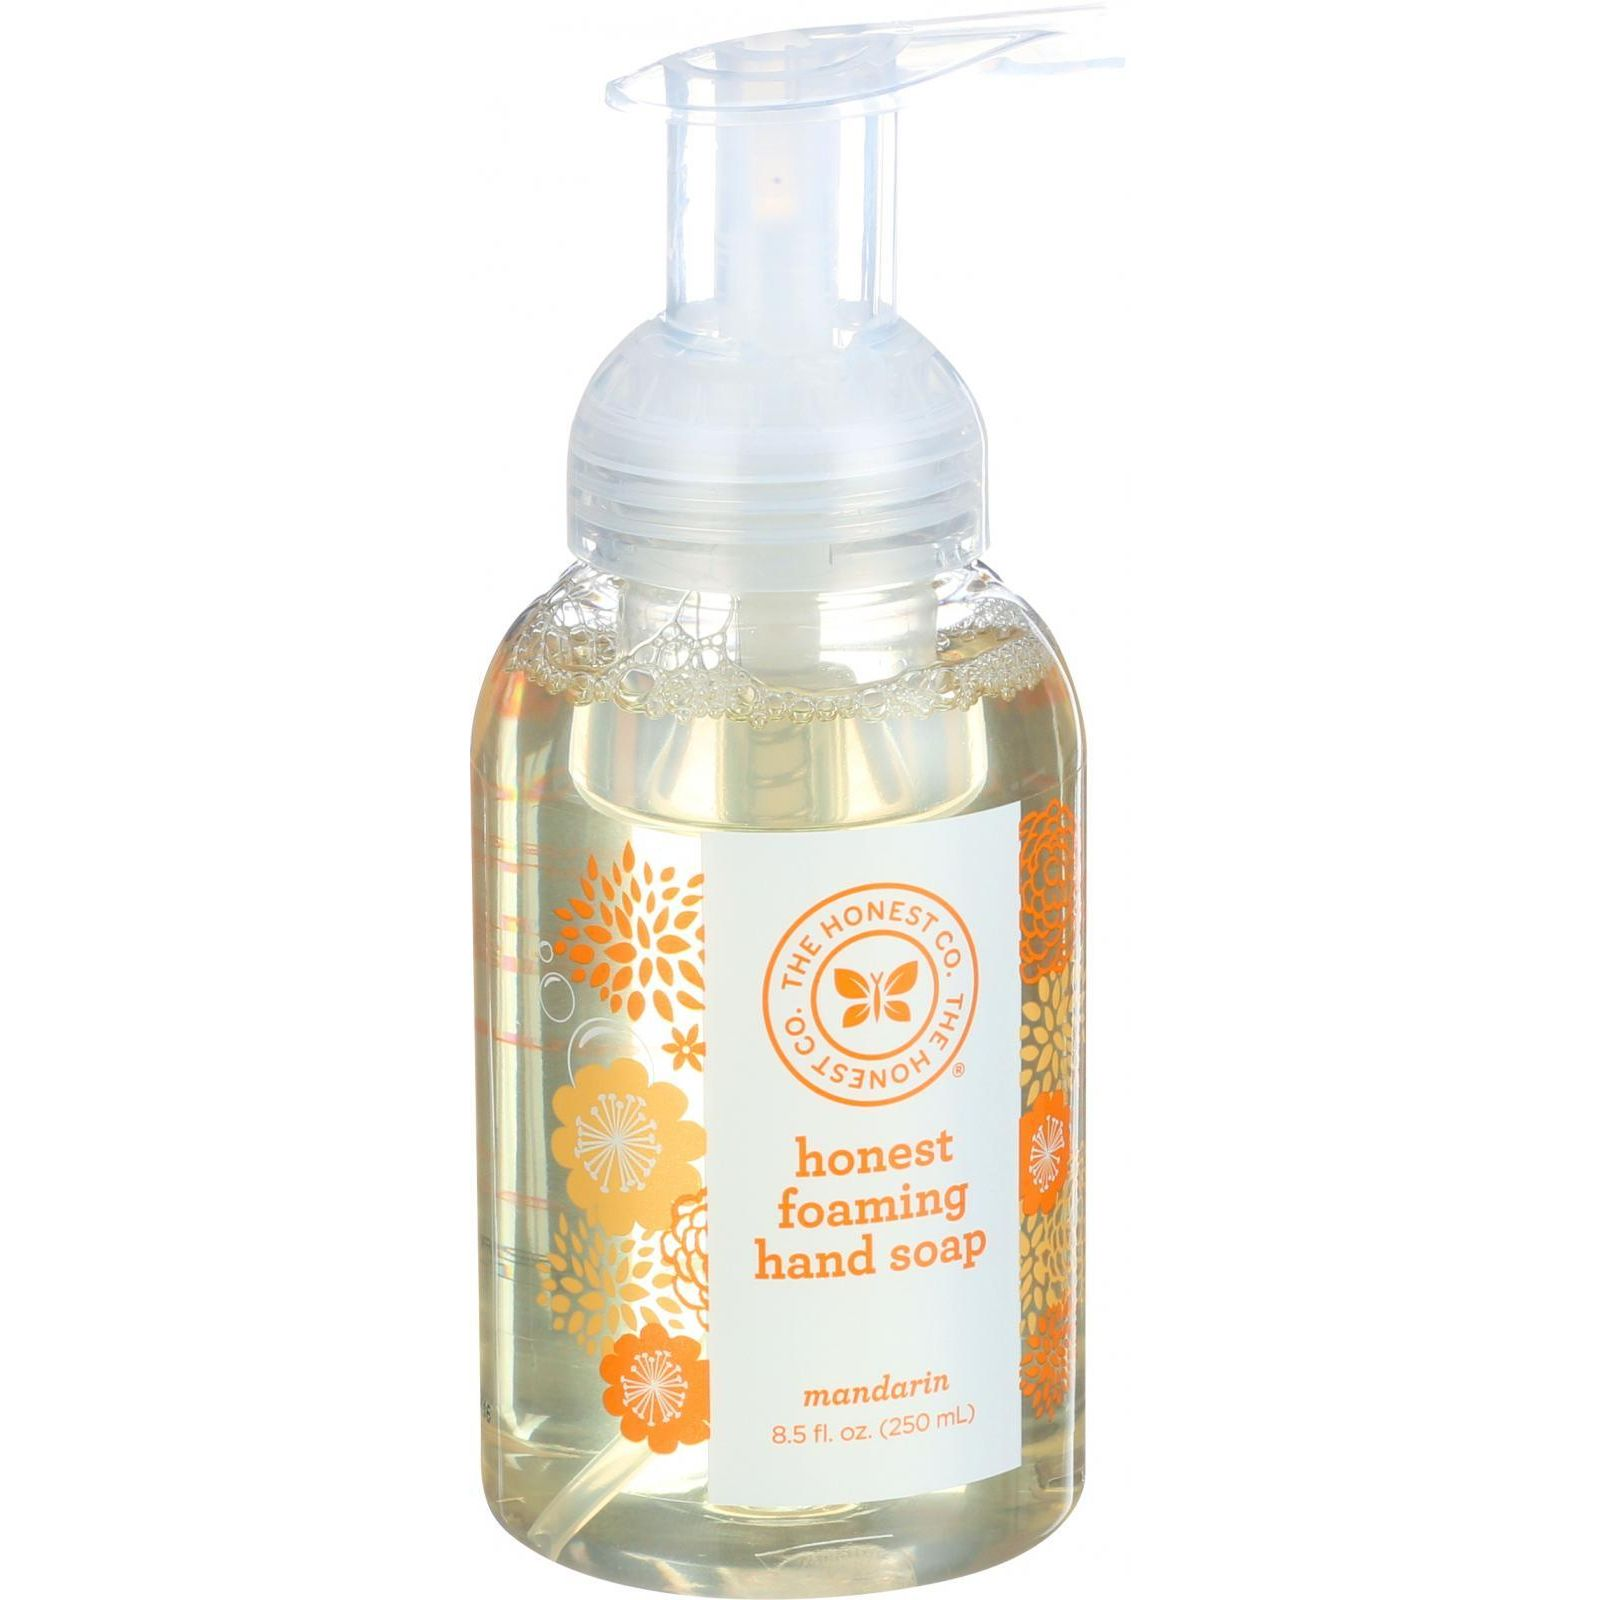 The Honest Company Honest Hand Soap - Foaming - Mandarin - 8.5 Oz